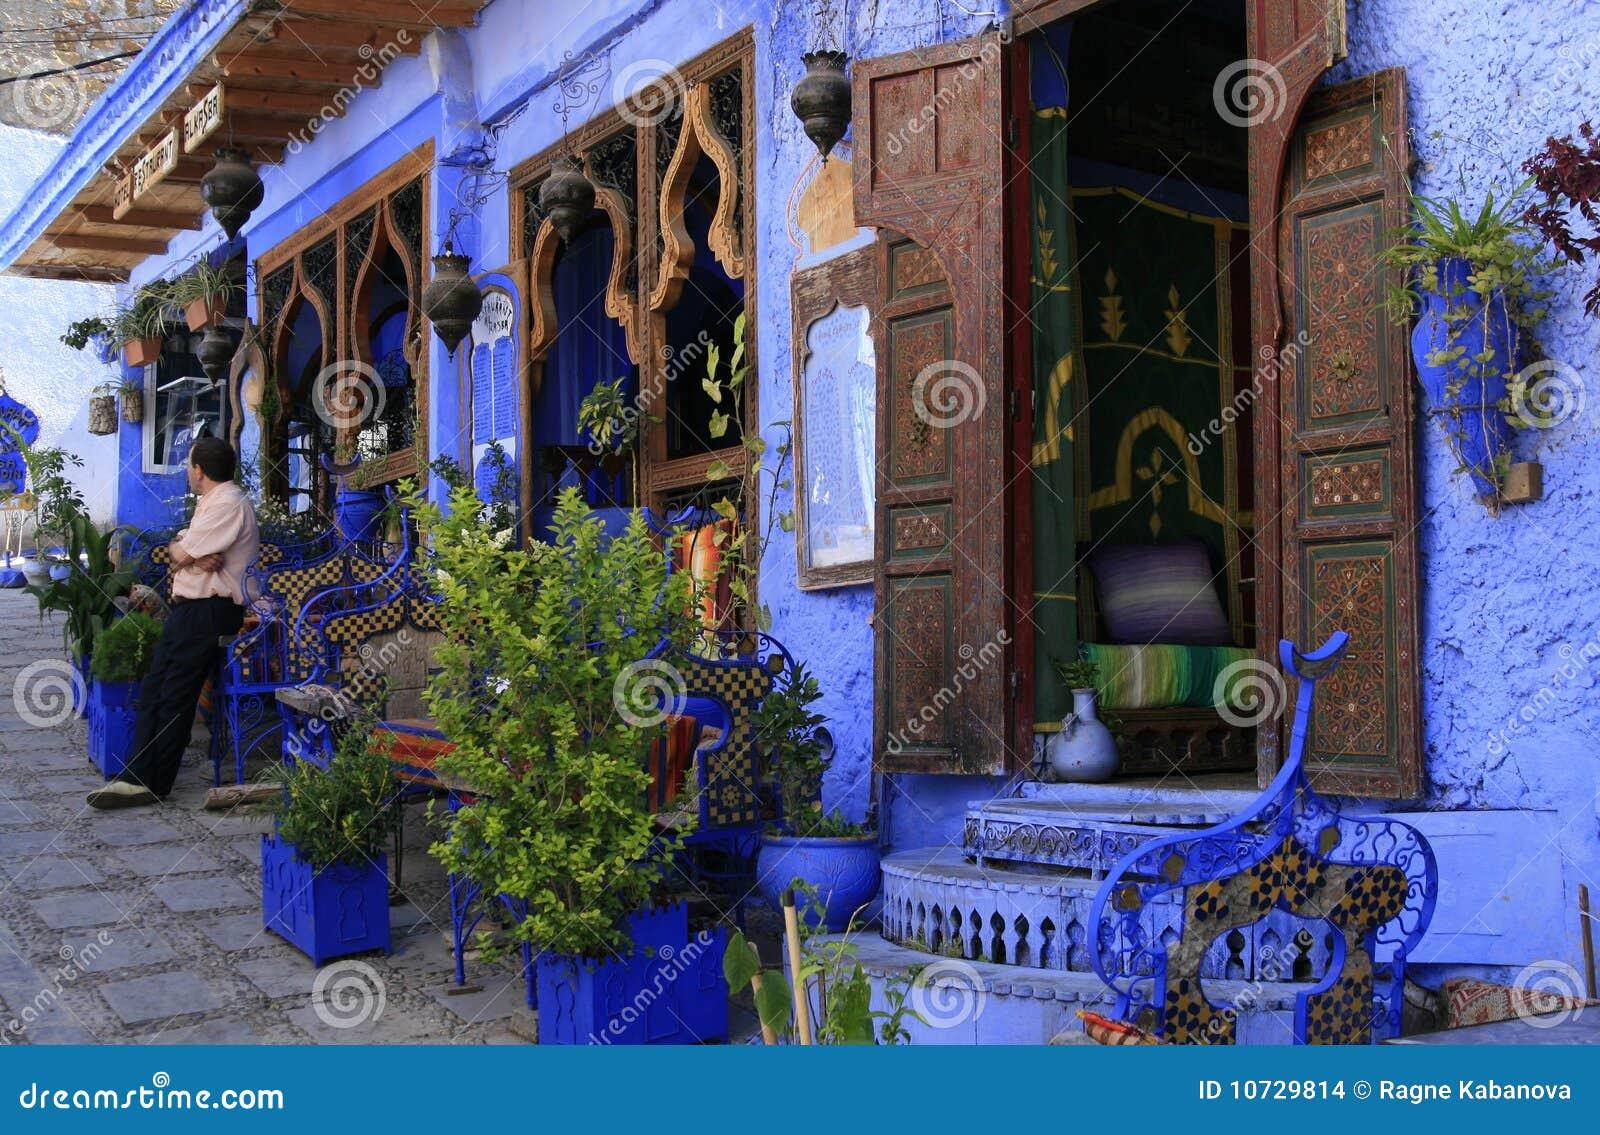 Restaurant ethnique dans Chefchaouen, Maroc